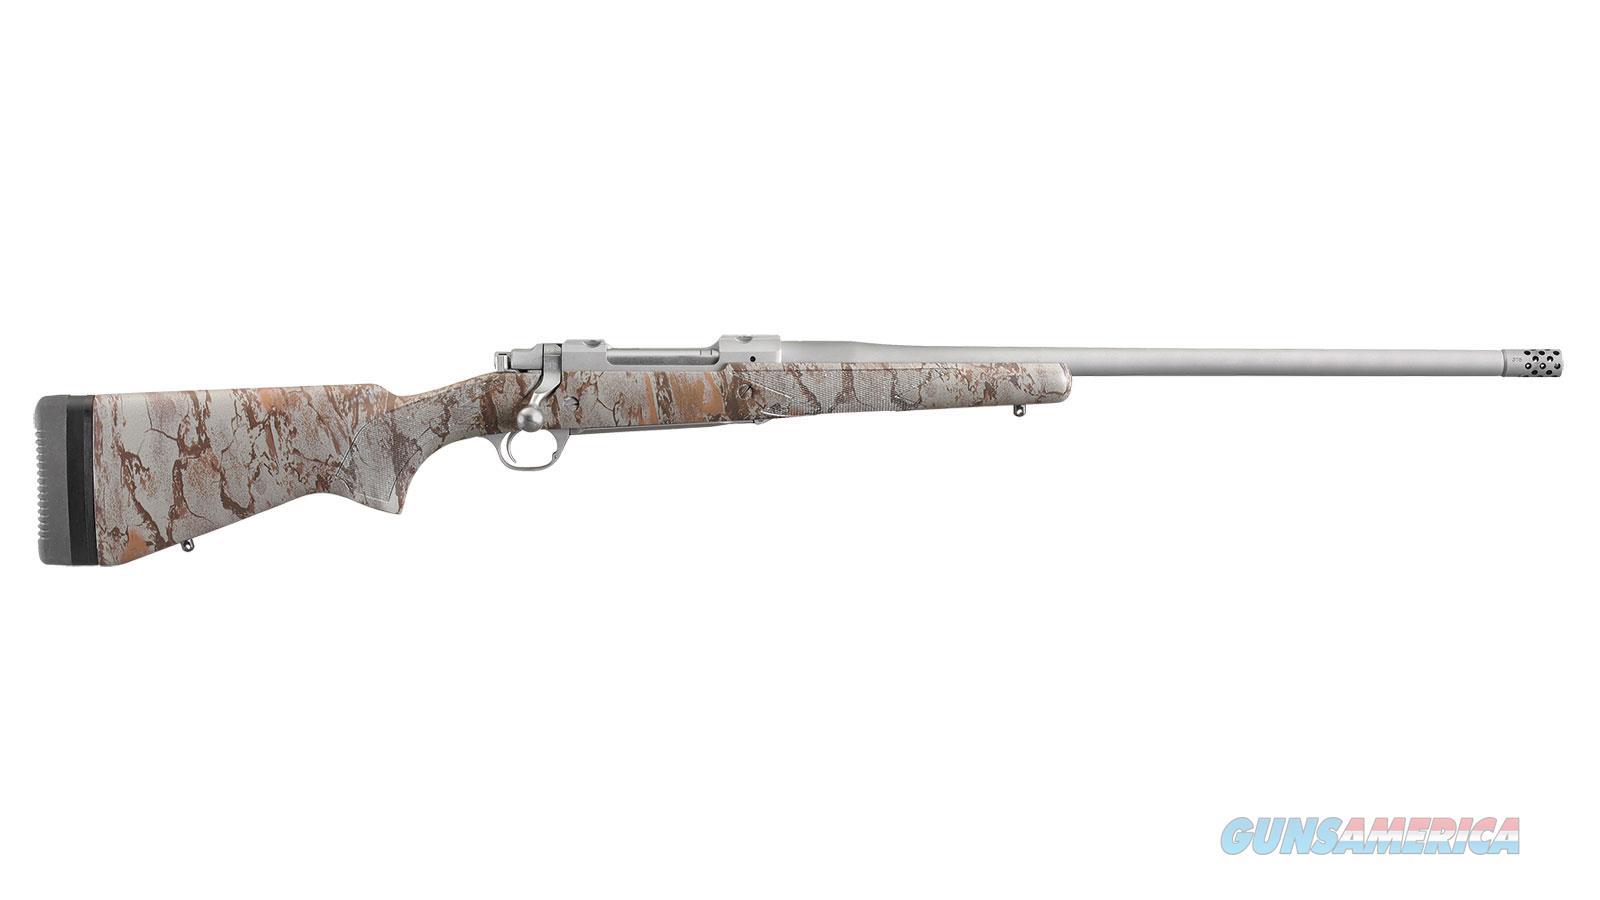 Ruger Hawkeye Ftw Hunter 308Win 22 Ss Camo Mbrak 47168  Guns > Rifles > R Misc Rifles